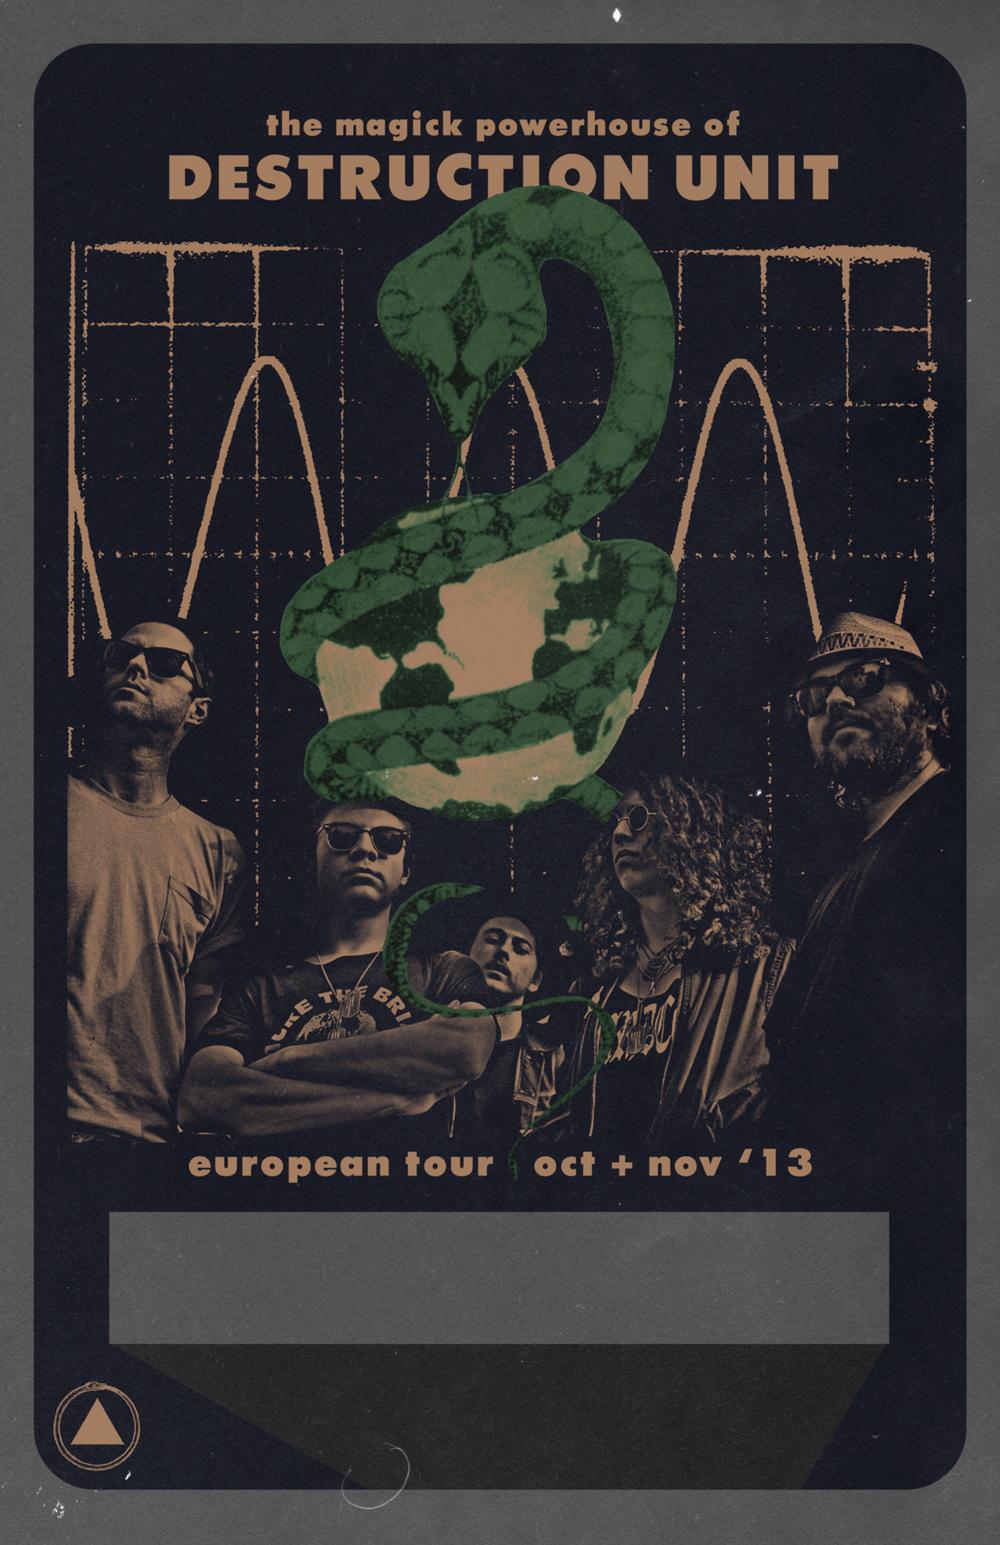 dunit-euro-tour-2013_1000.jpg